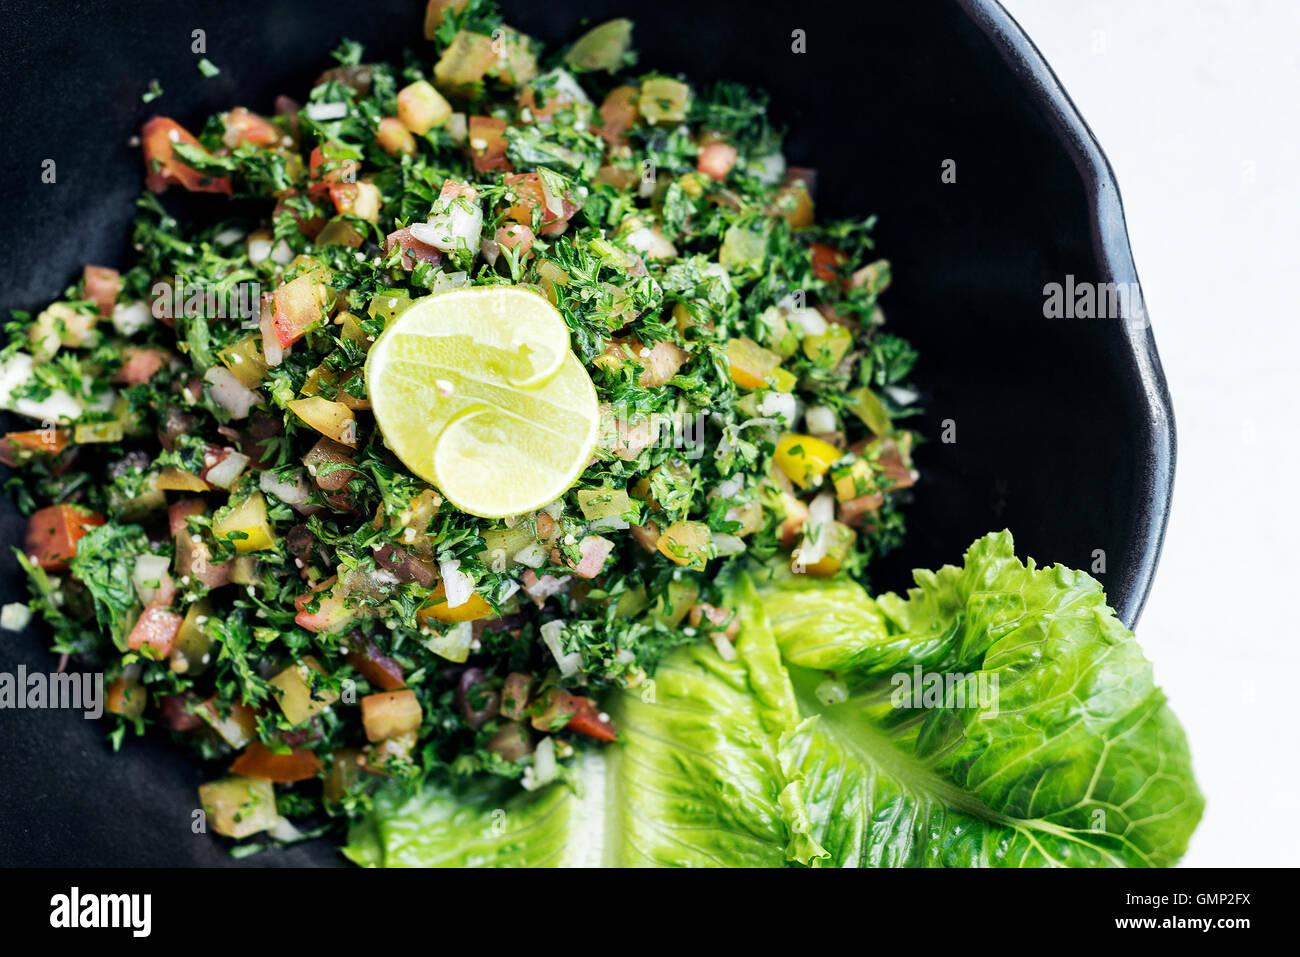 Tabouleh traditionellen libanesischen orientalisch frischer Salat Schüssel Meze Mezze starter Stockbild